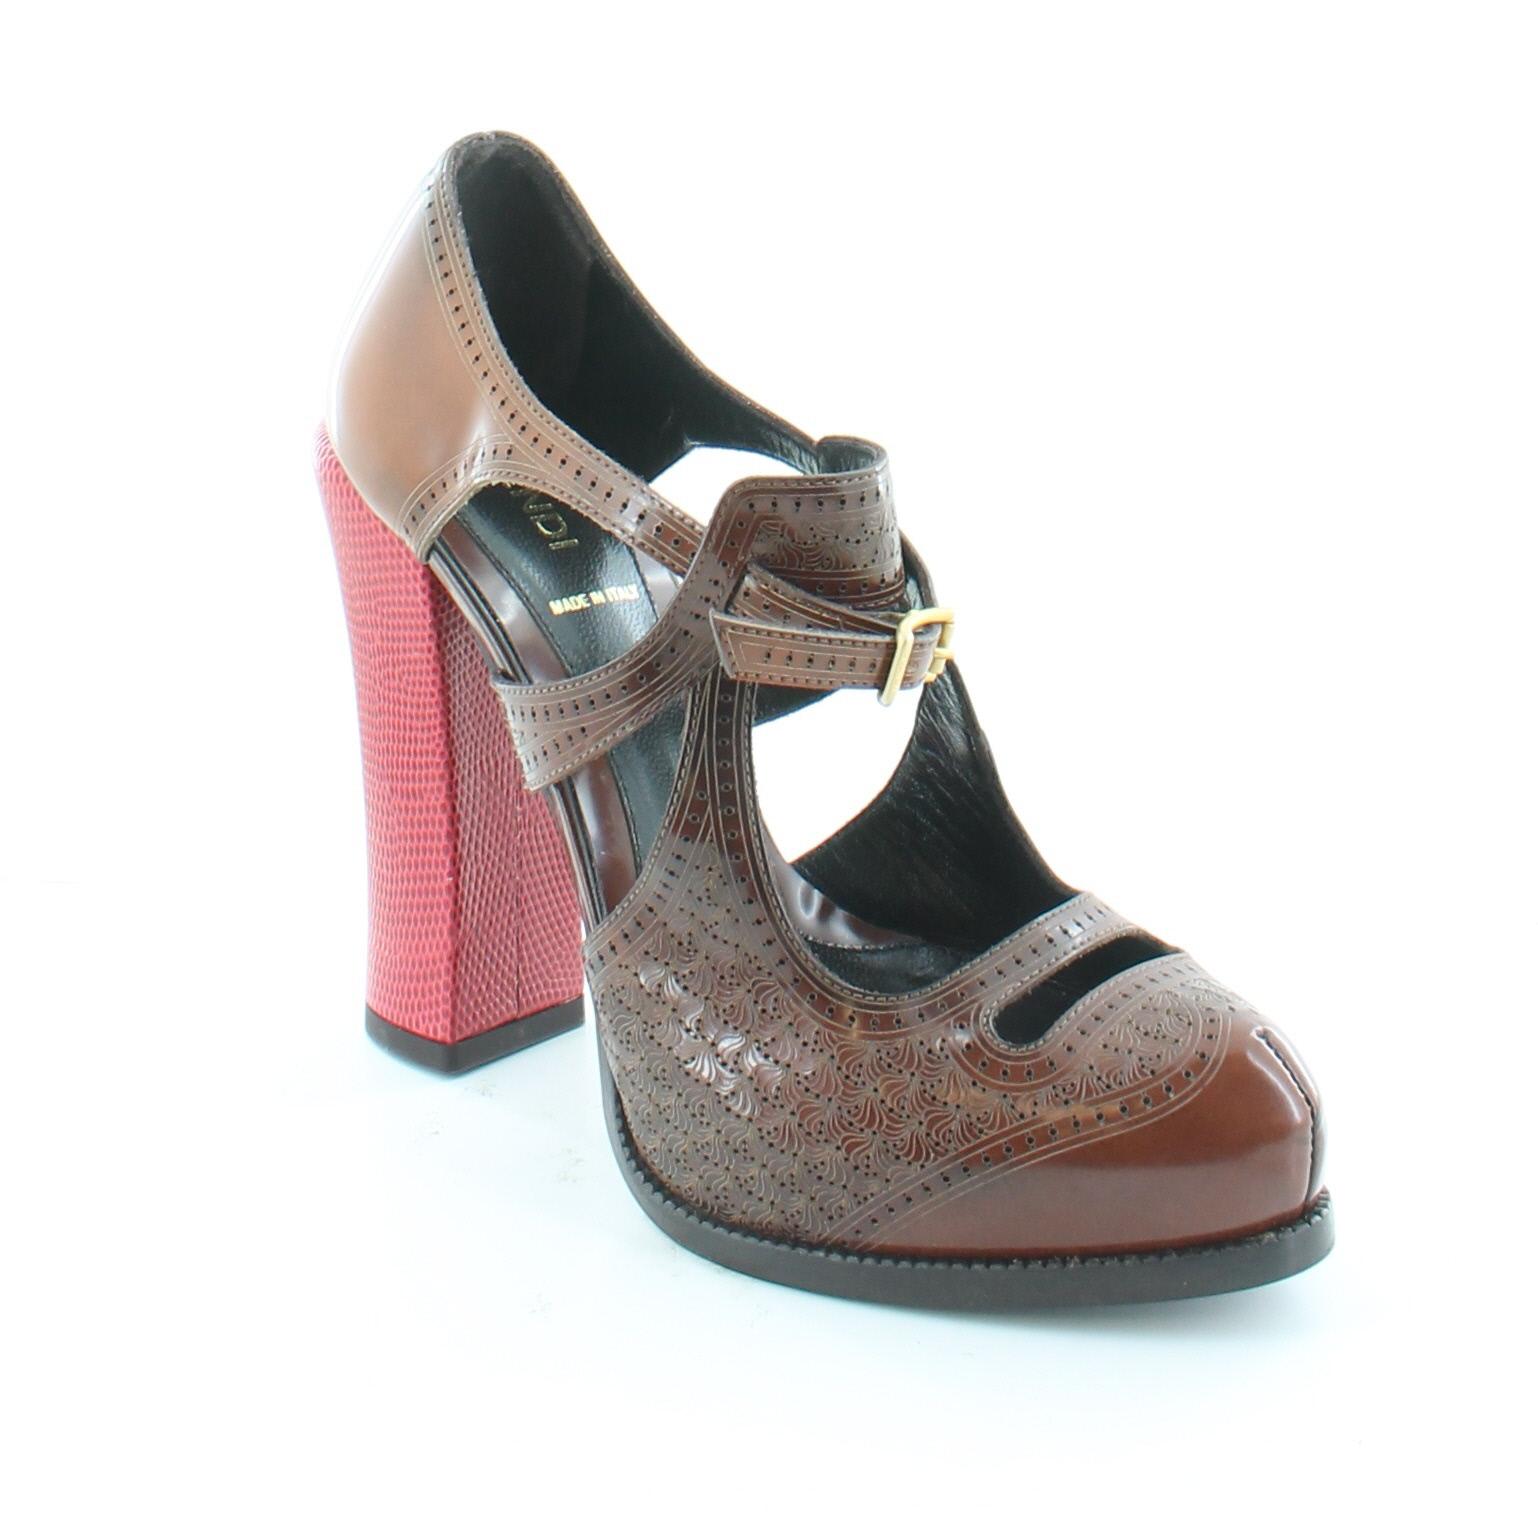 fendi polifonia brown womens shoes size 8 5 m heels msrp